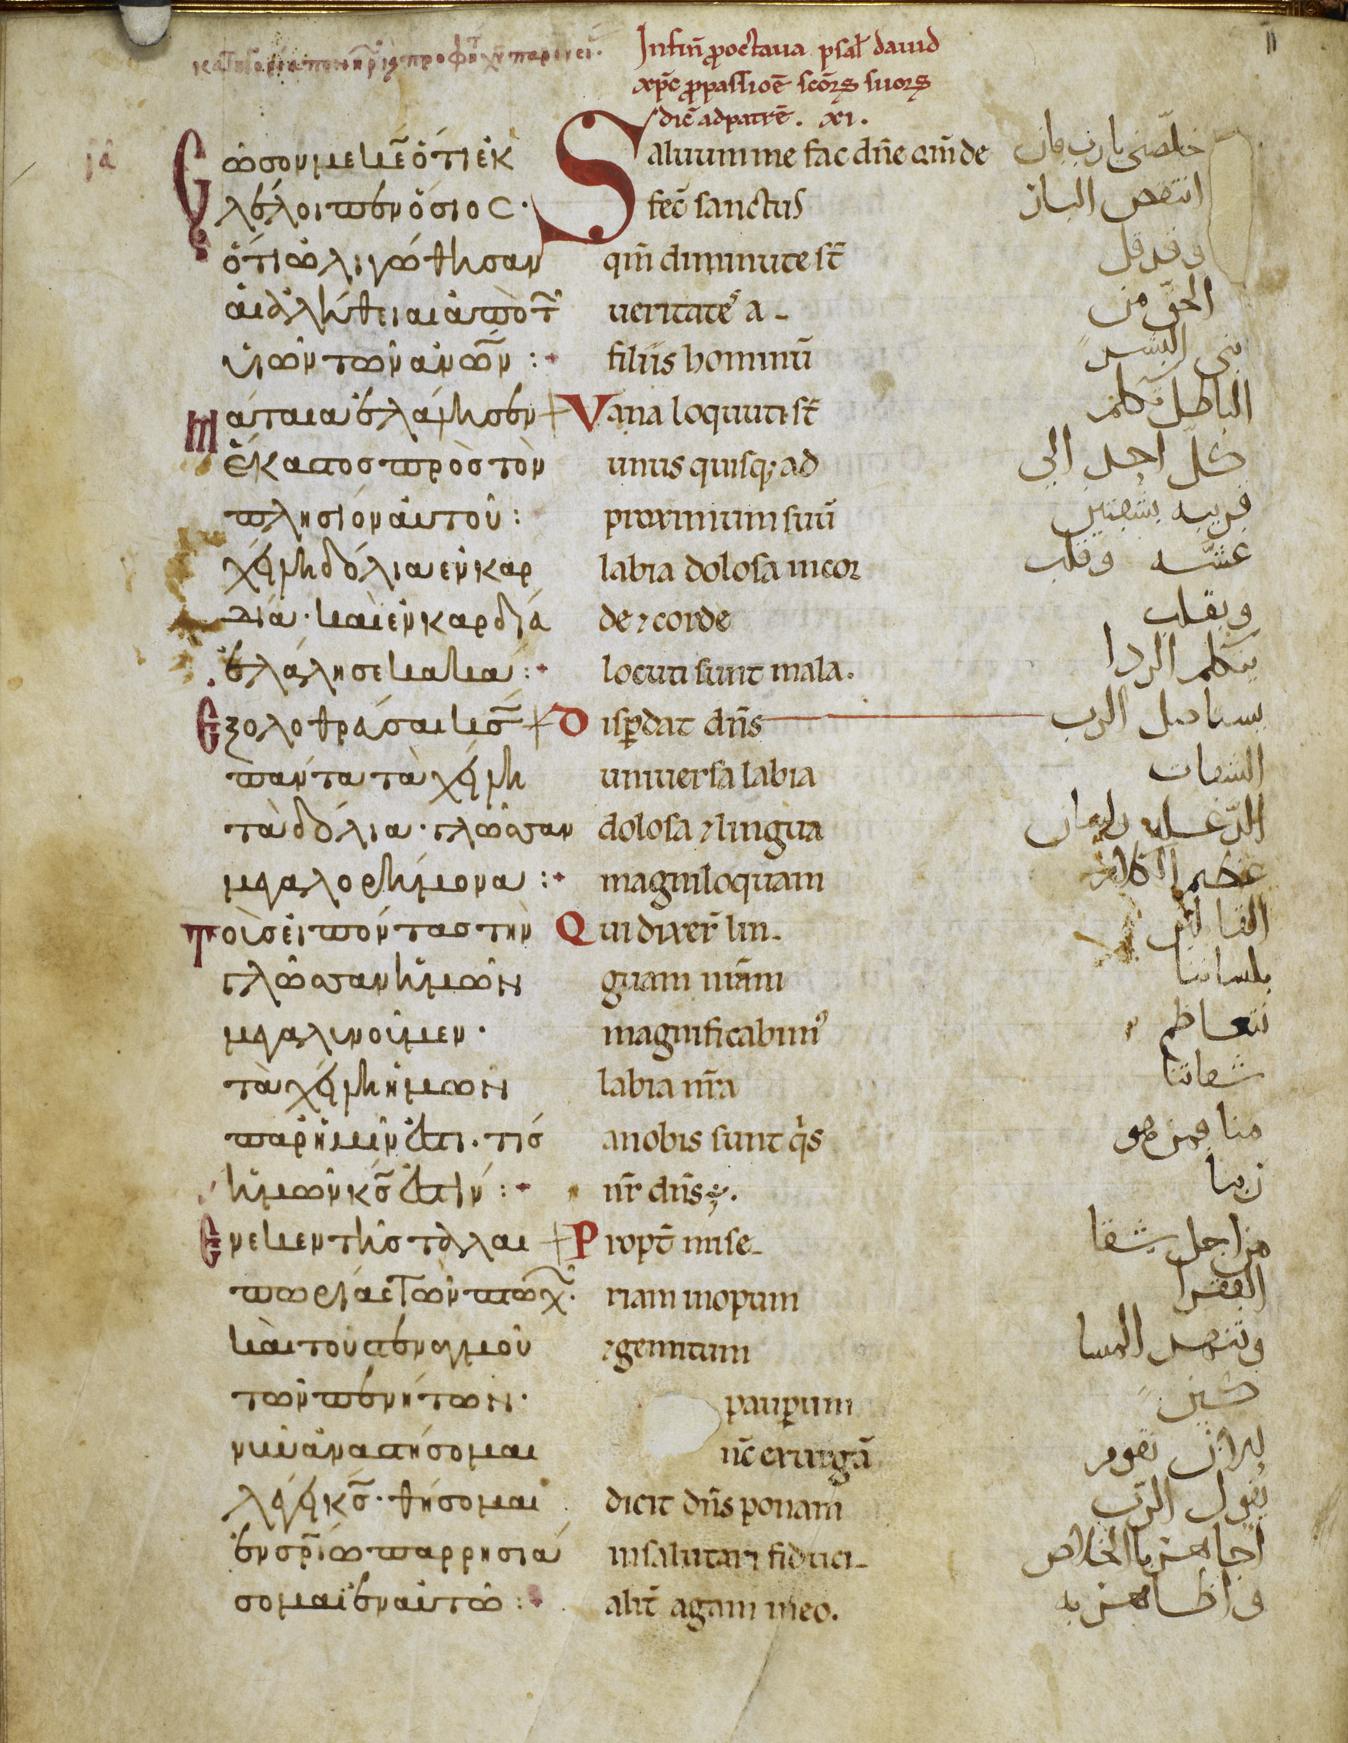 Bron: Harley Trilingual Psalter (before 1153). British Library, Harley MS 5786.